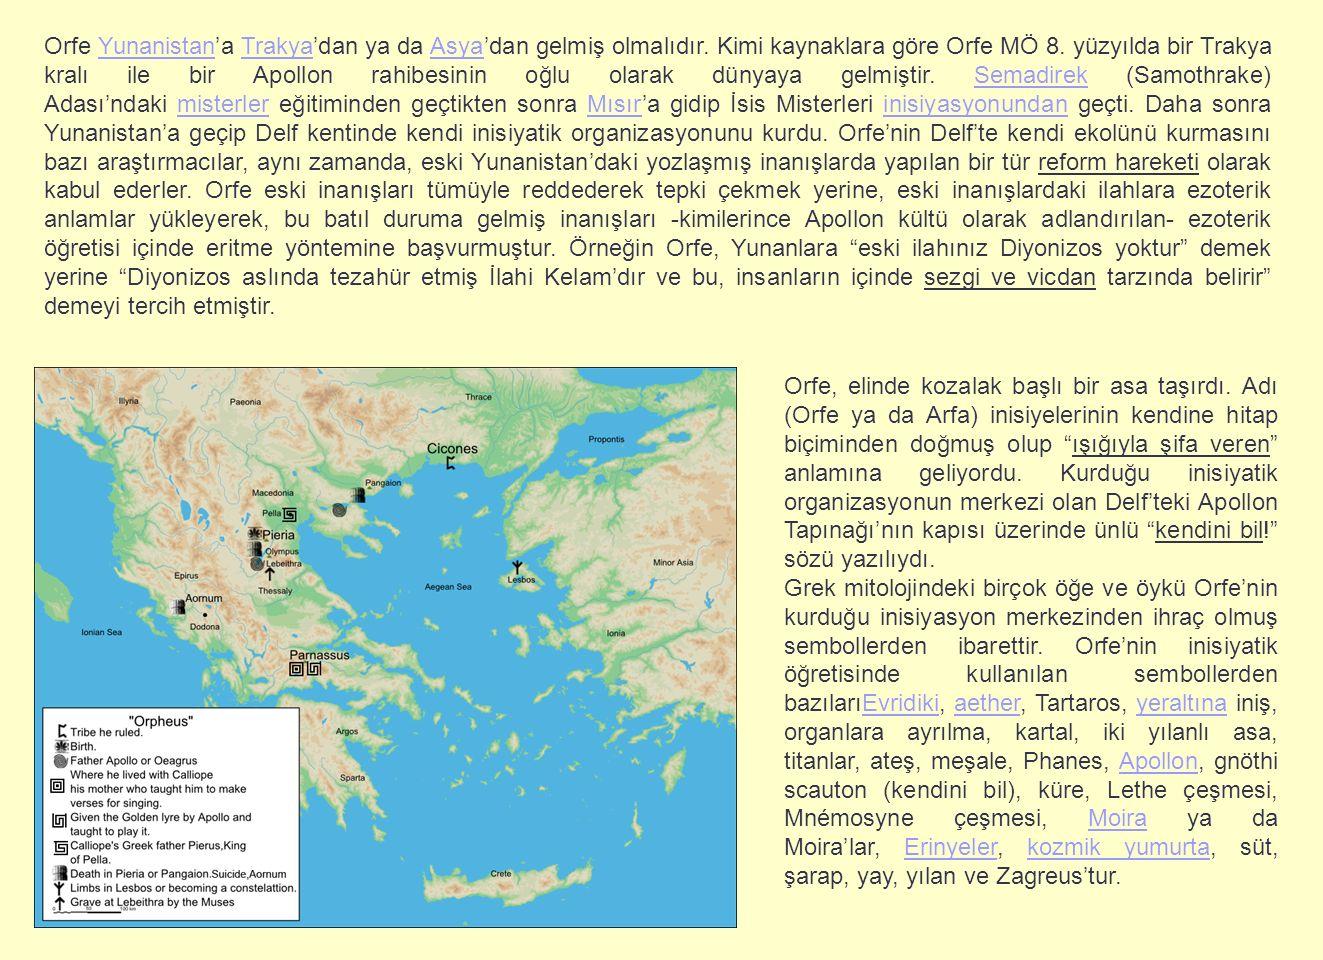 Orfe Yunanistan'a Trakya'dan ya da Asya'dan gelmiş olmalıdır